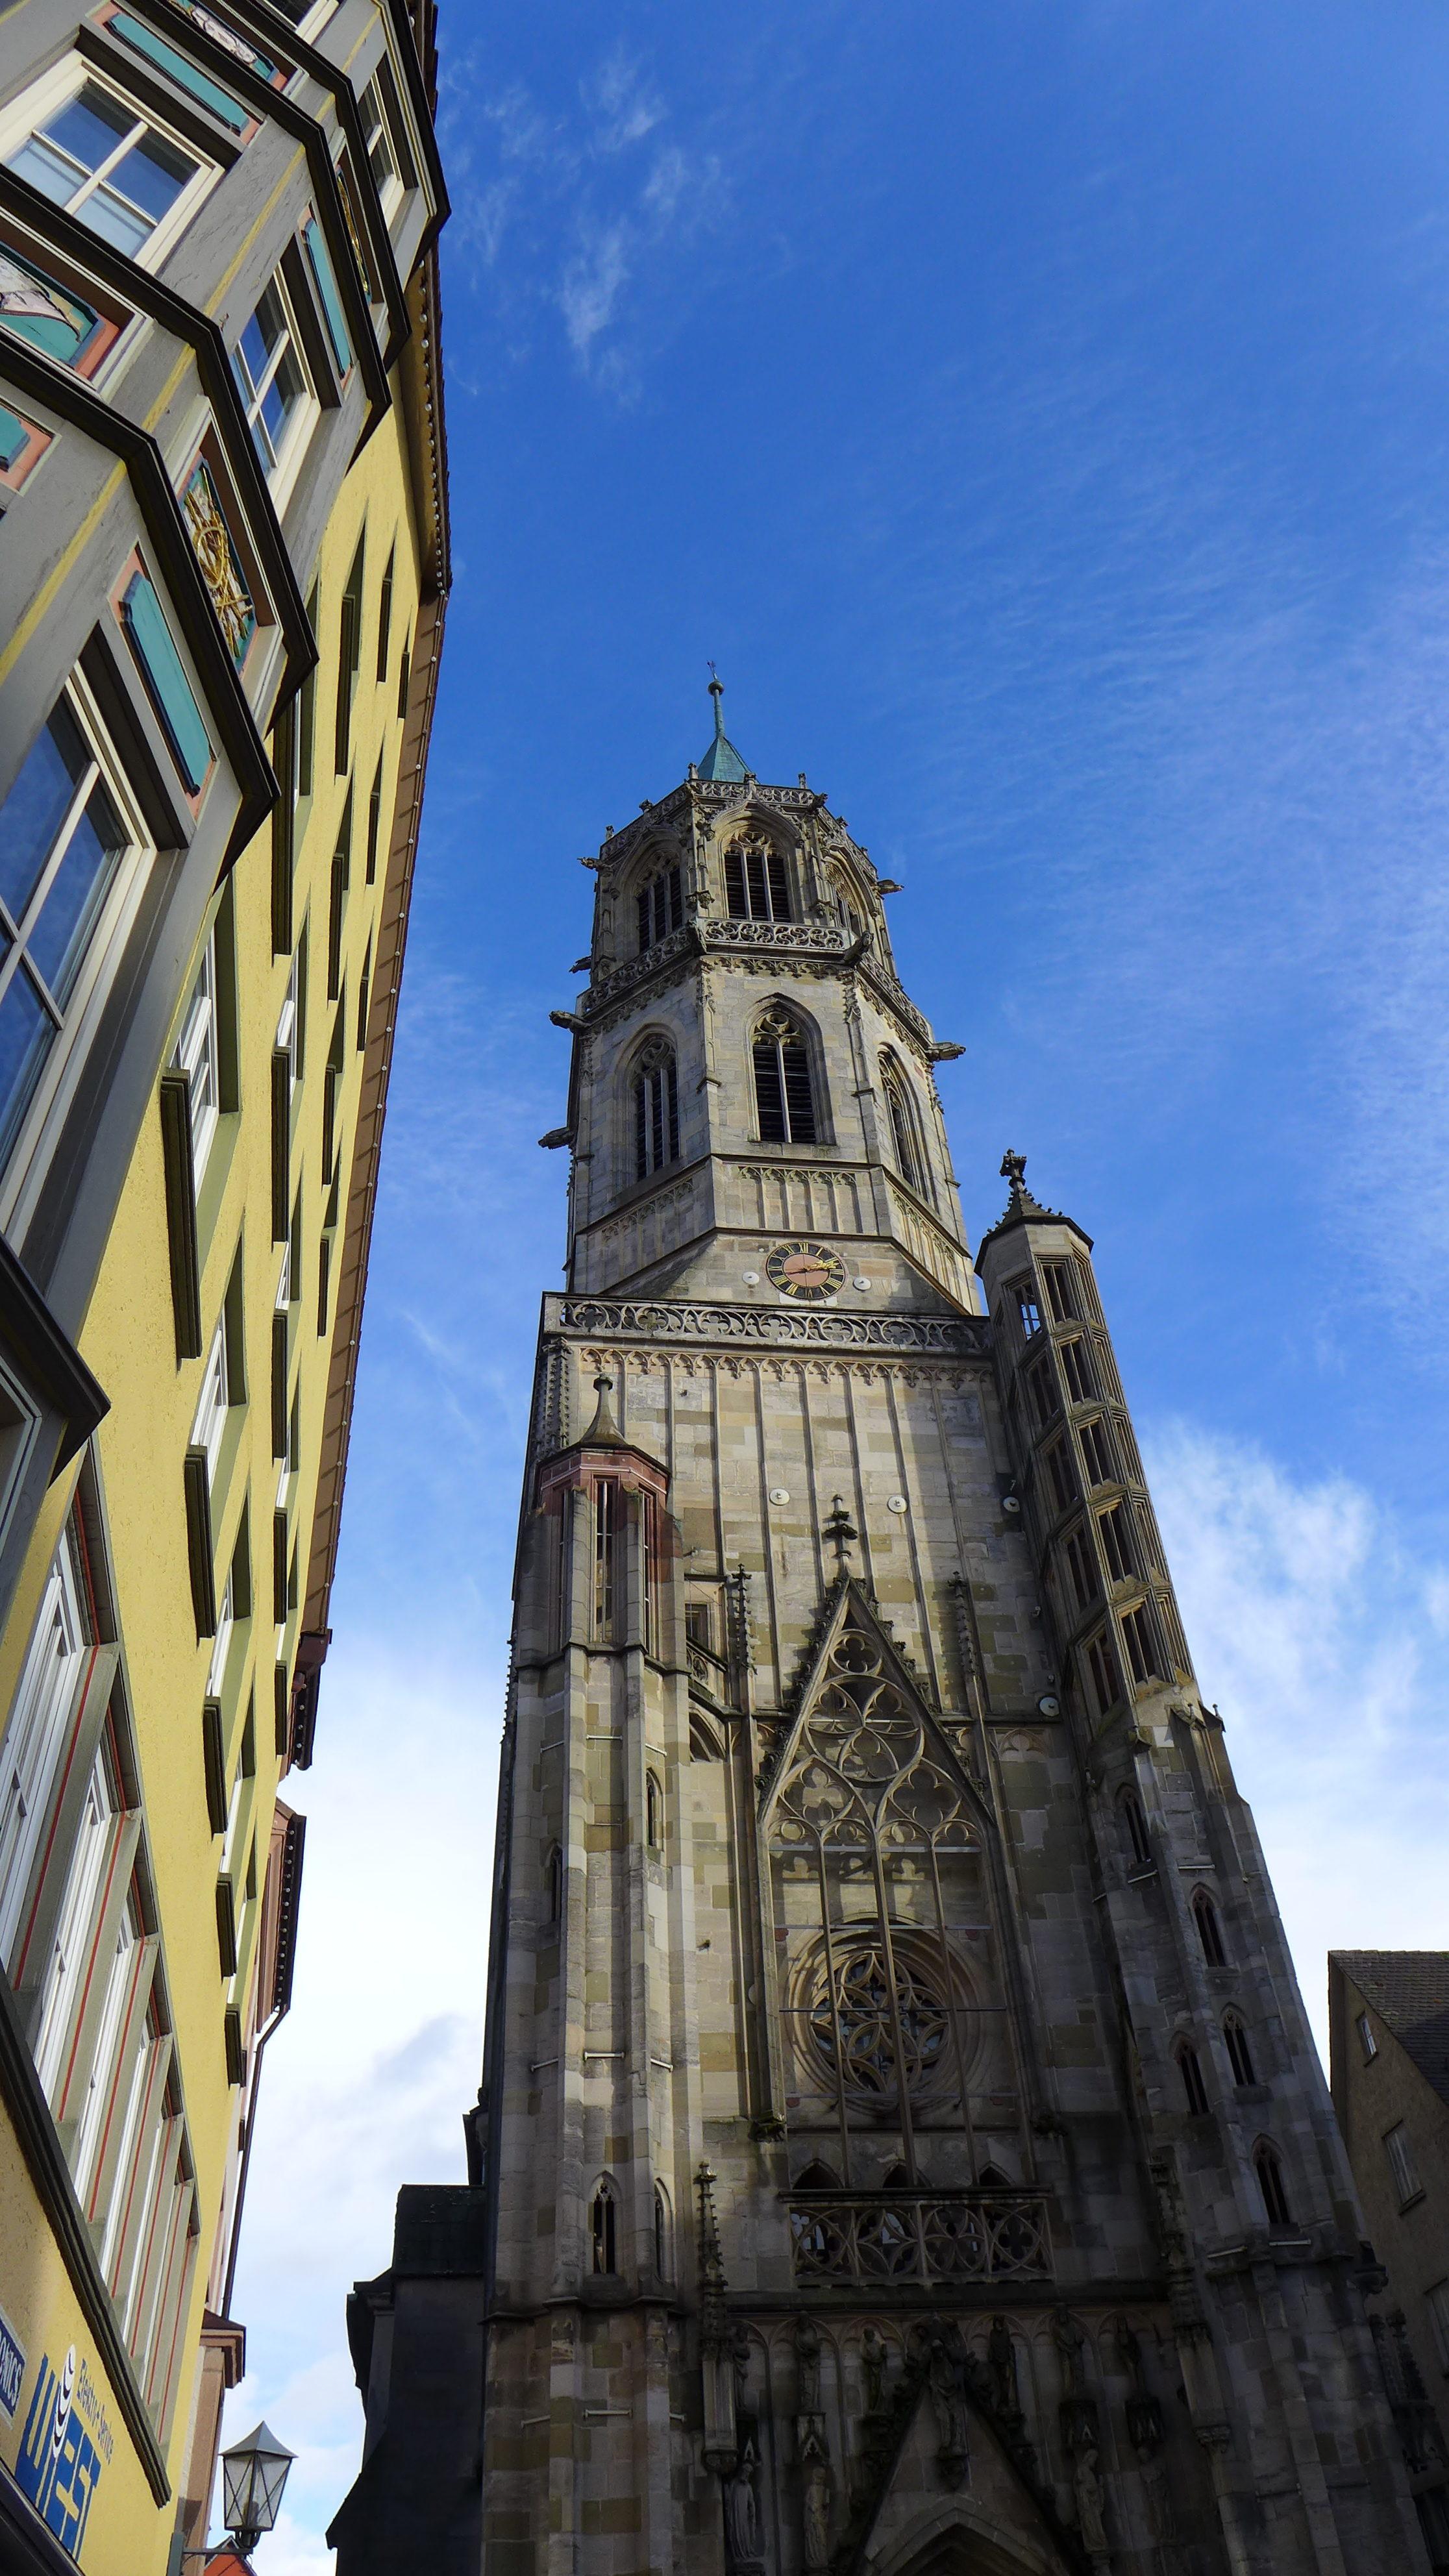 Kapellenkirche, Gotik, historisches Rottweil